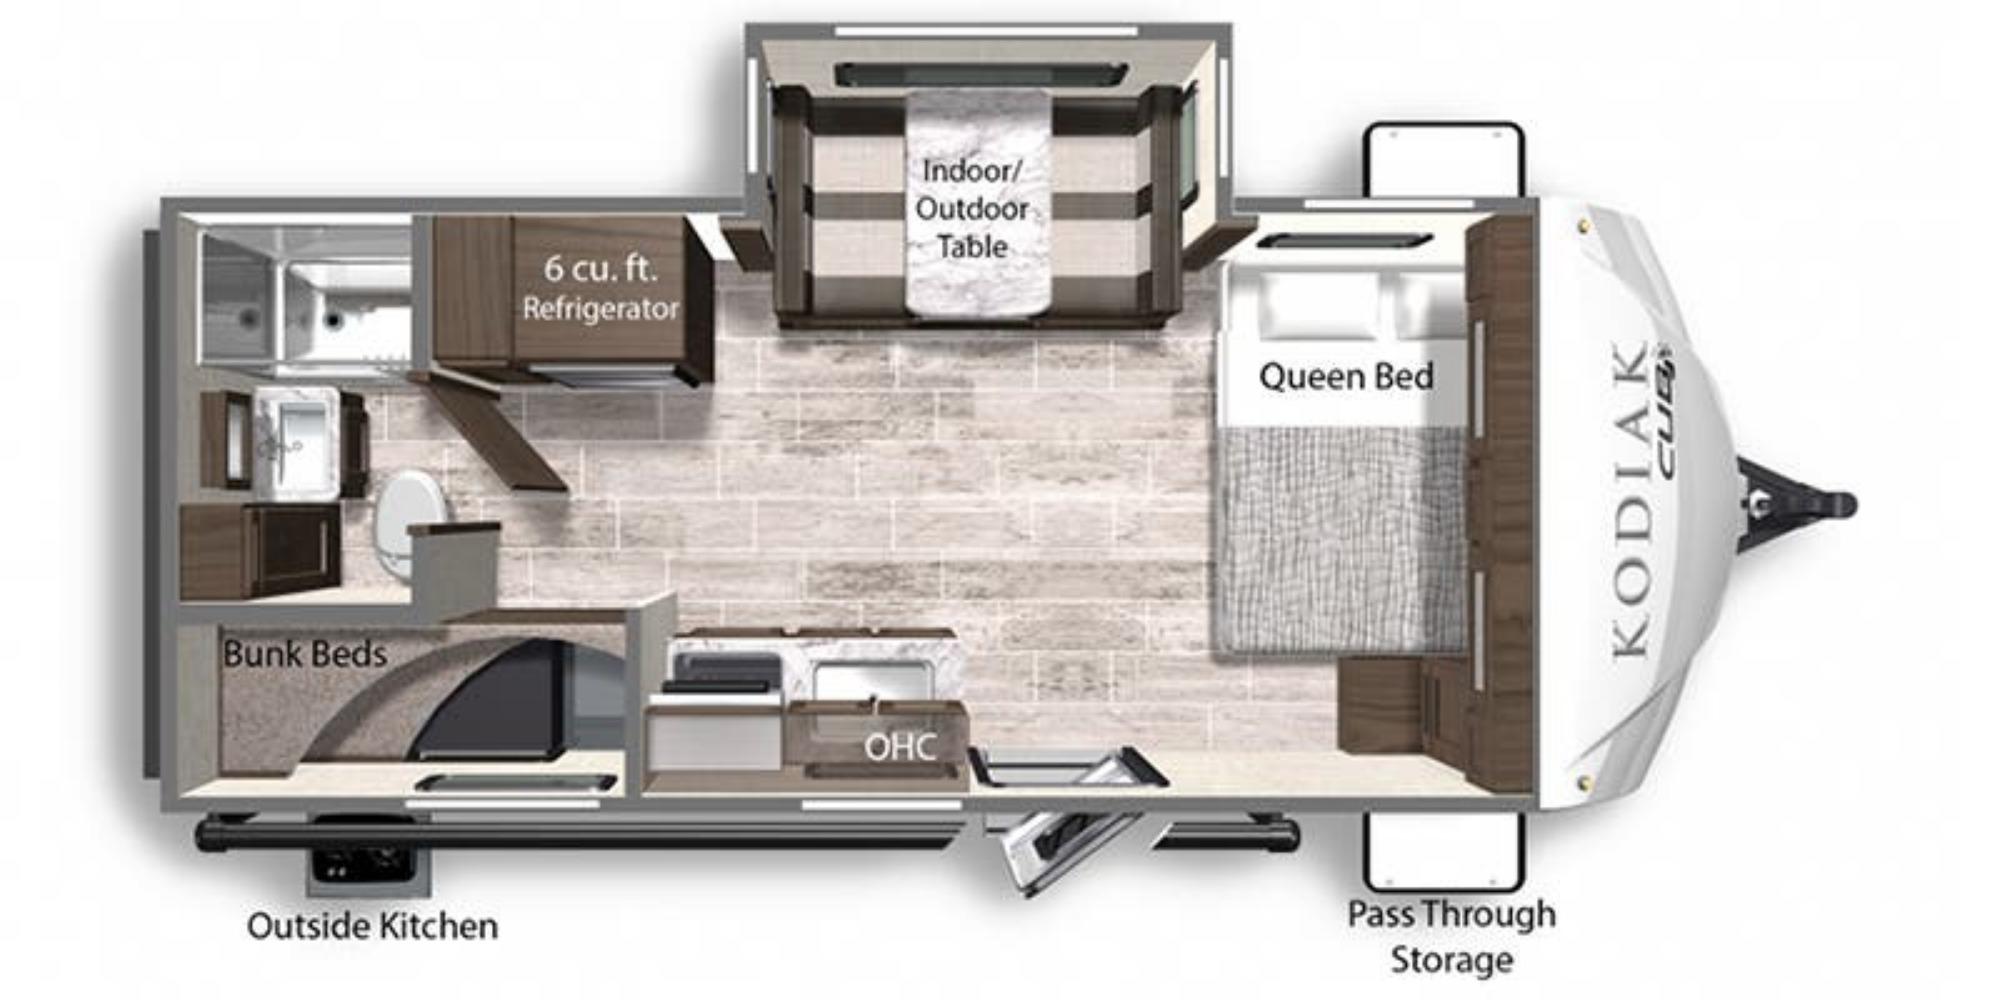 View Floor Plan for 2021 DUTCHMEN KODIAK CUB 196BH